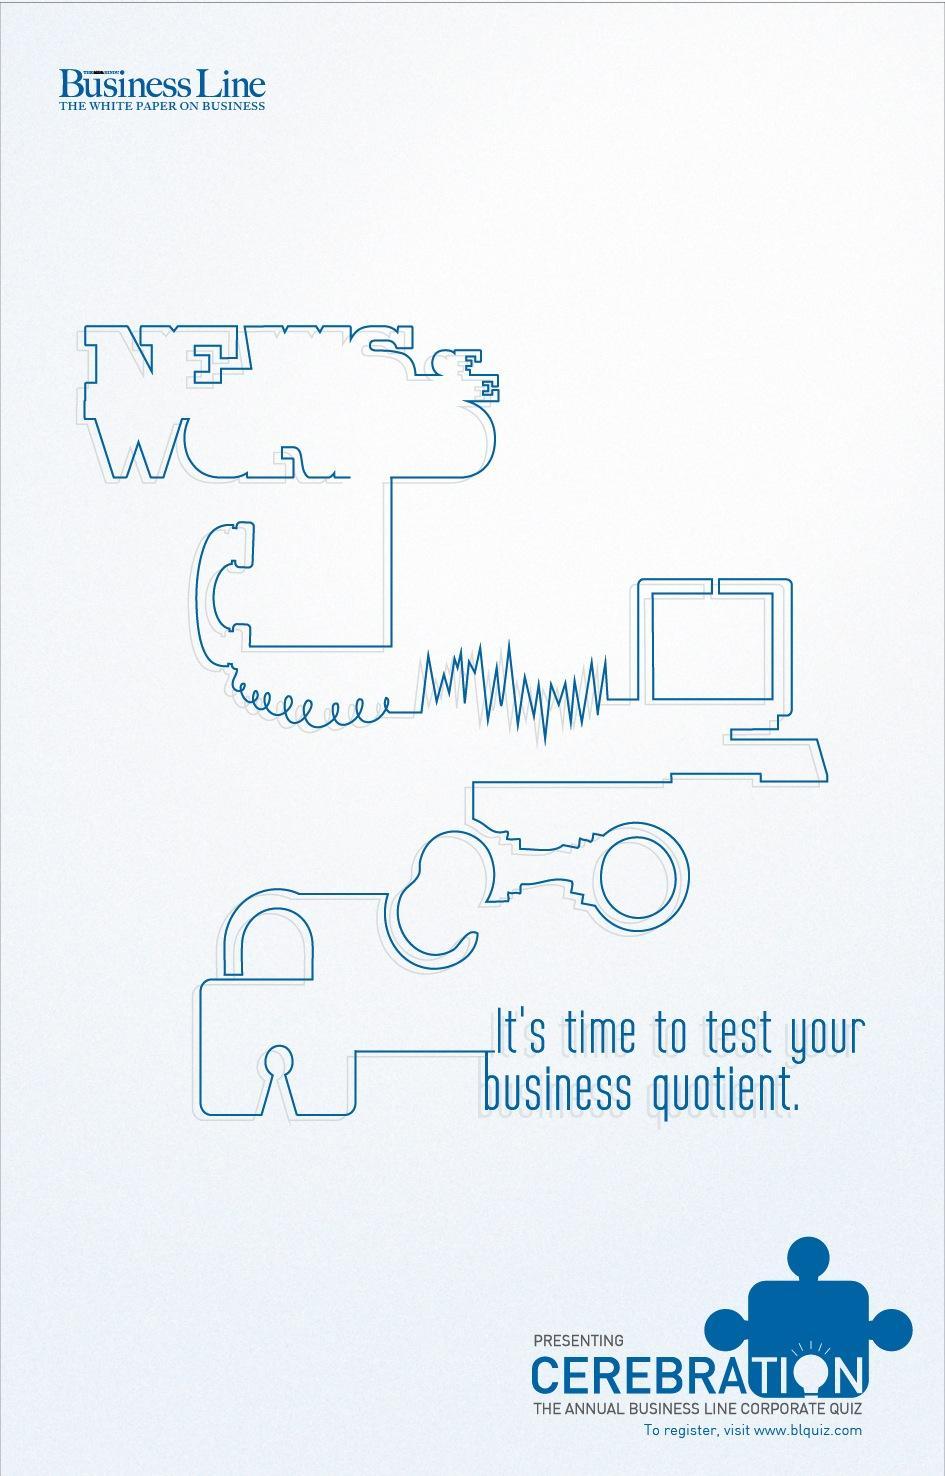 Business Line Print Ad -  Test, 3